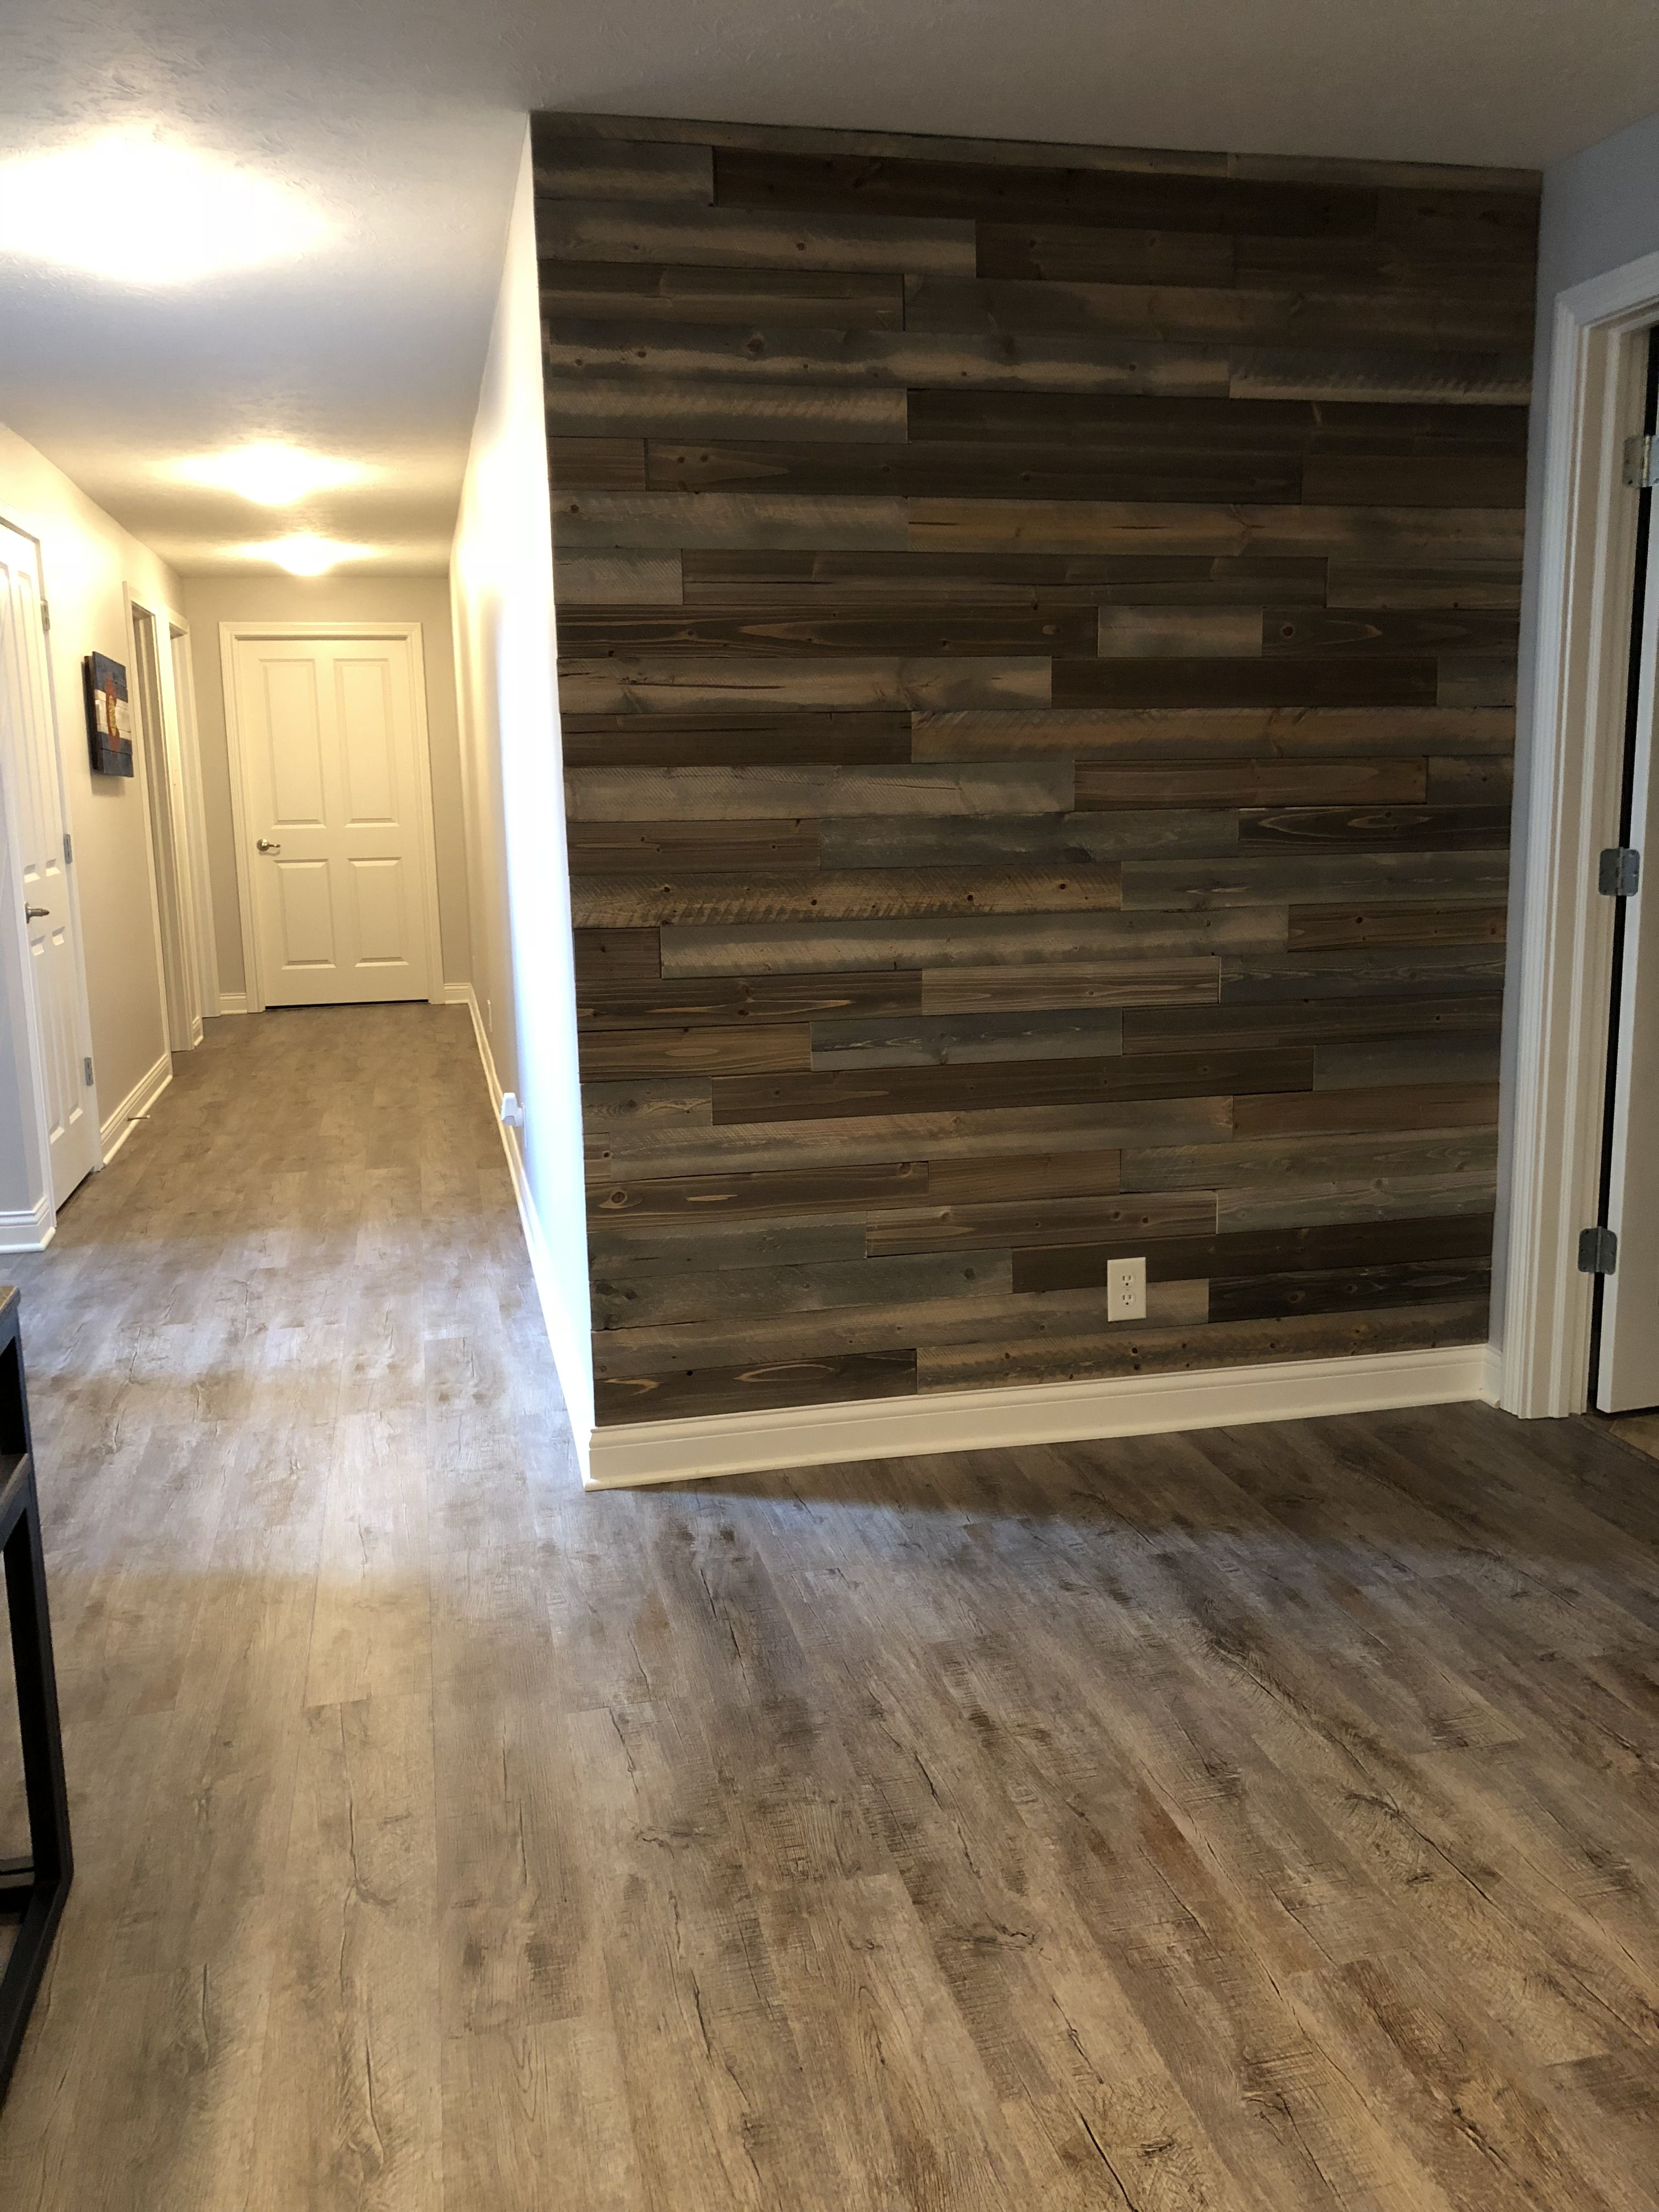 Rustic pallet wall | Rustic flooring, Old pallets, Rustic wood